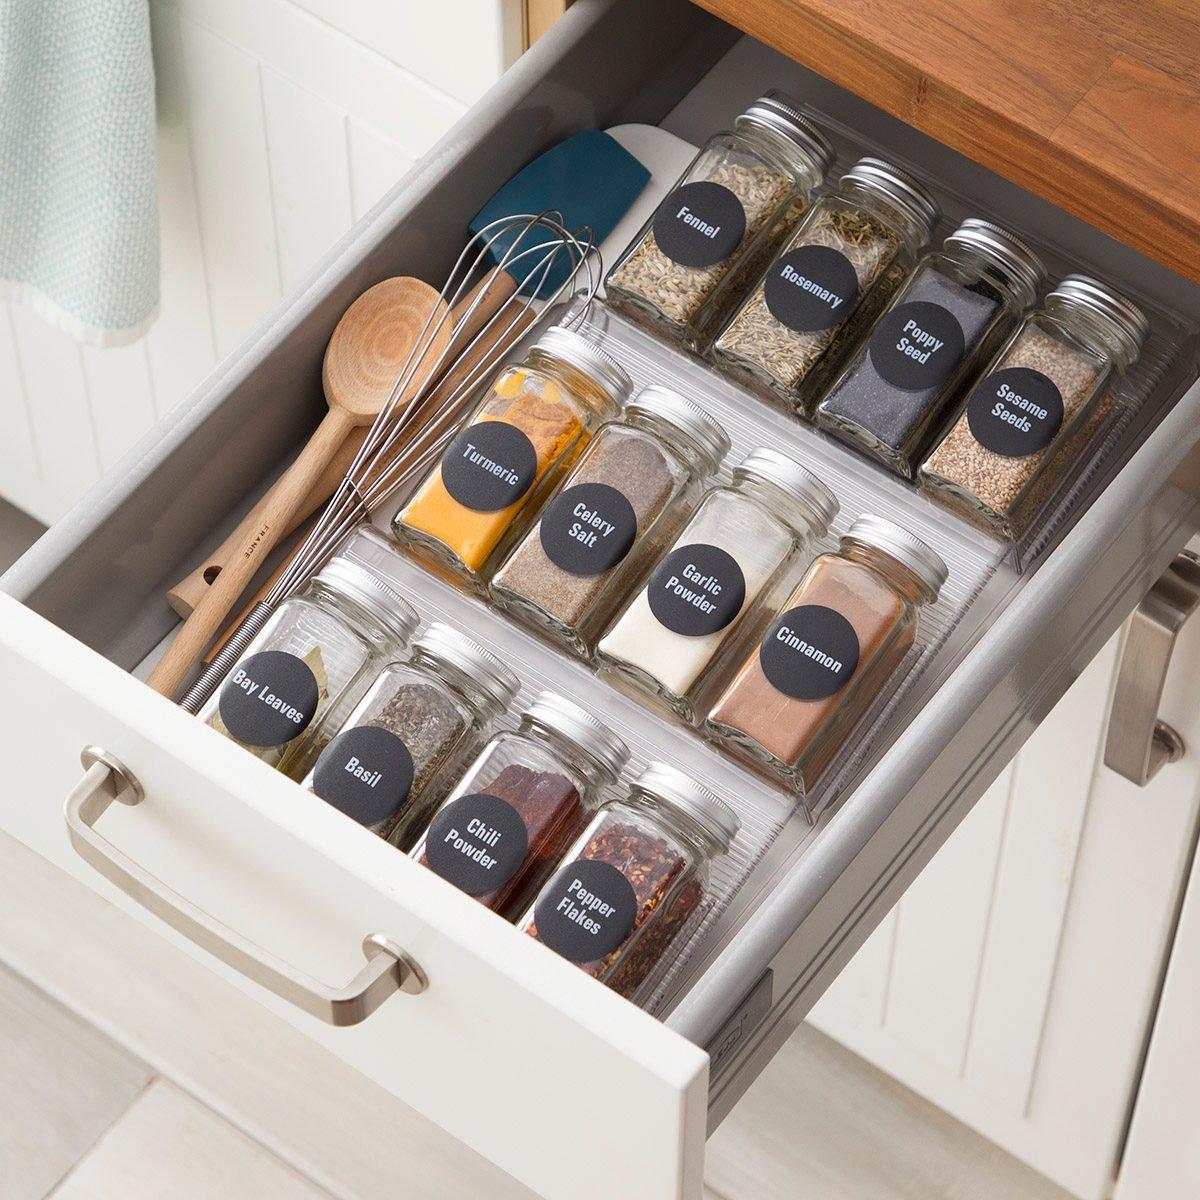 20 Kitchen Storage Ideas That Will Free Up So Much Space Taste Of Home